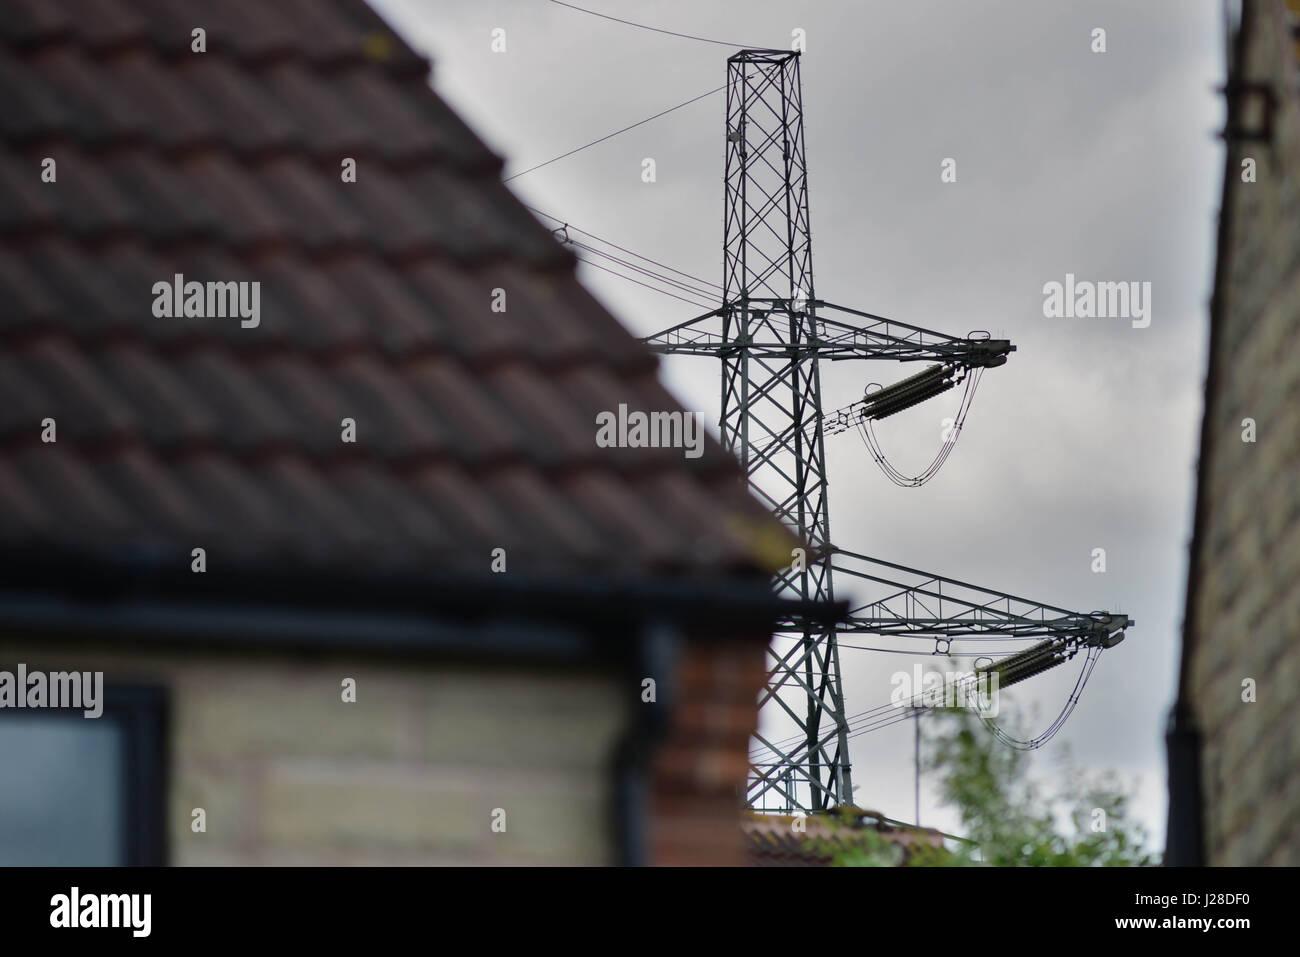 Electricity Pylon Cables Near House Stock Photos & Electricity Pylon ...